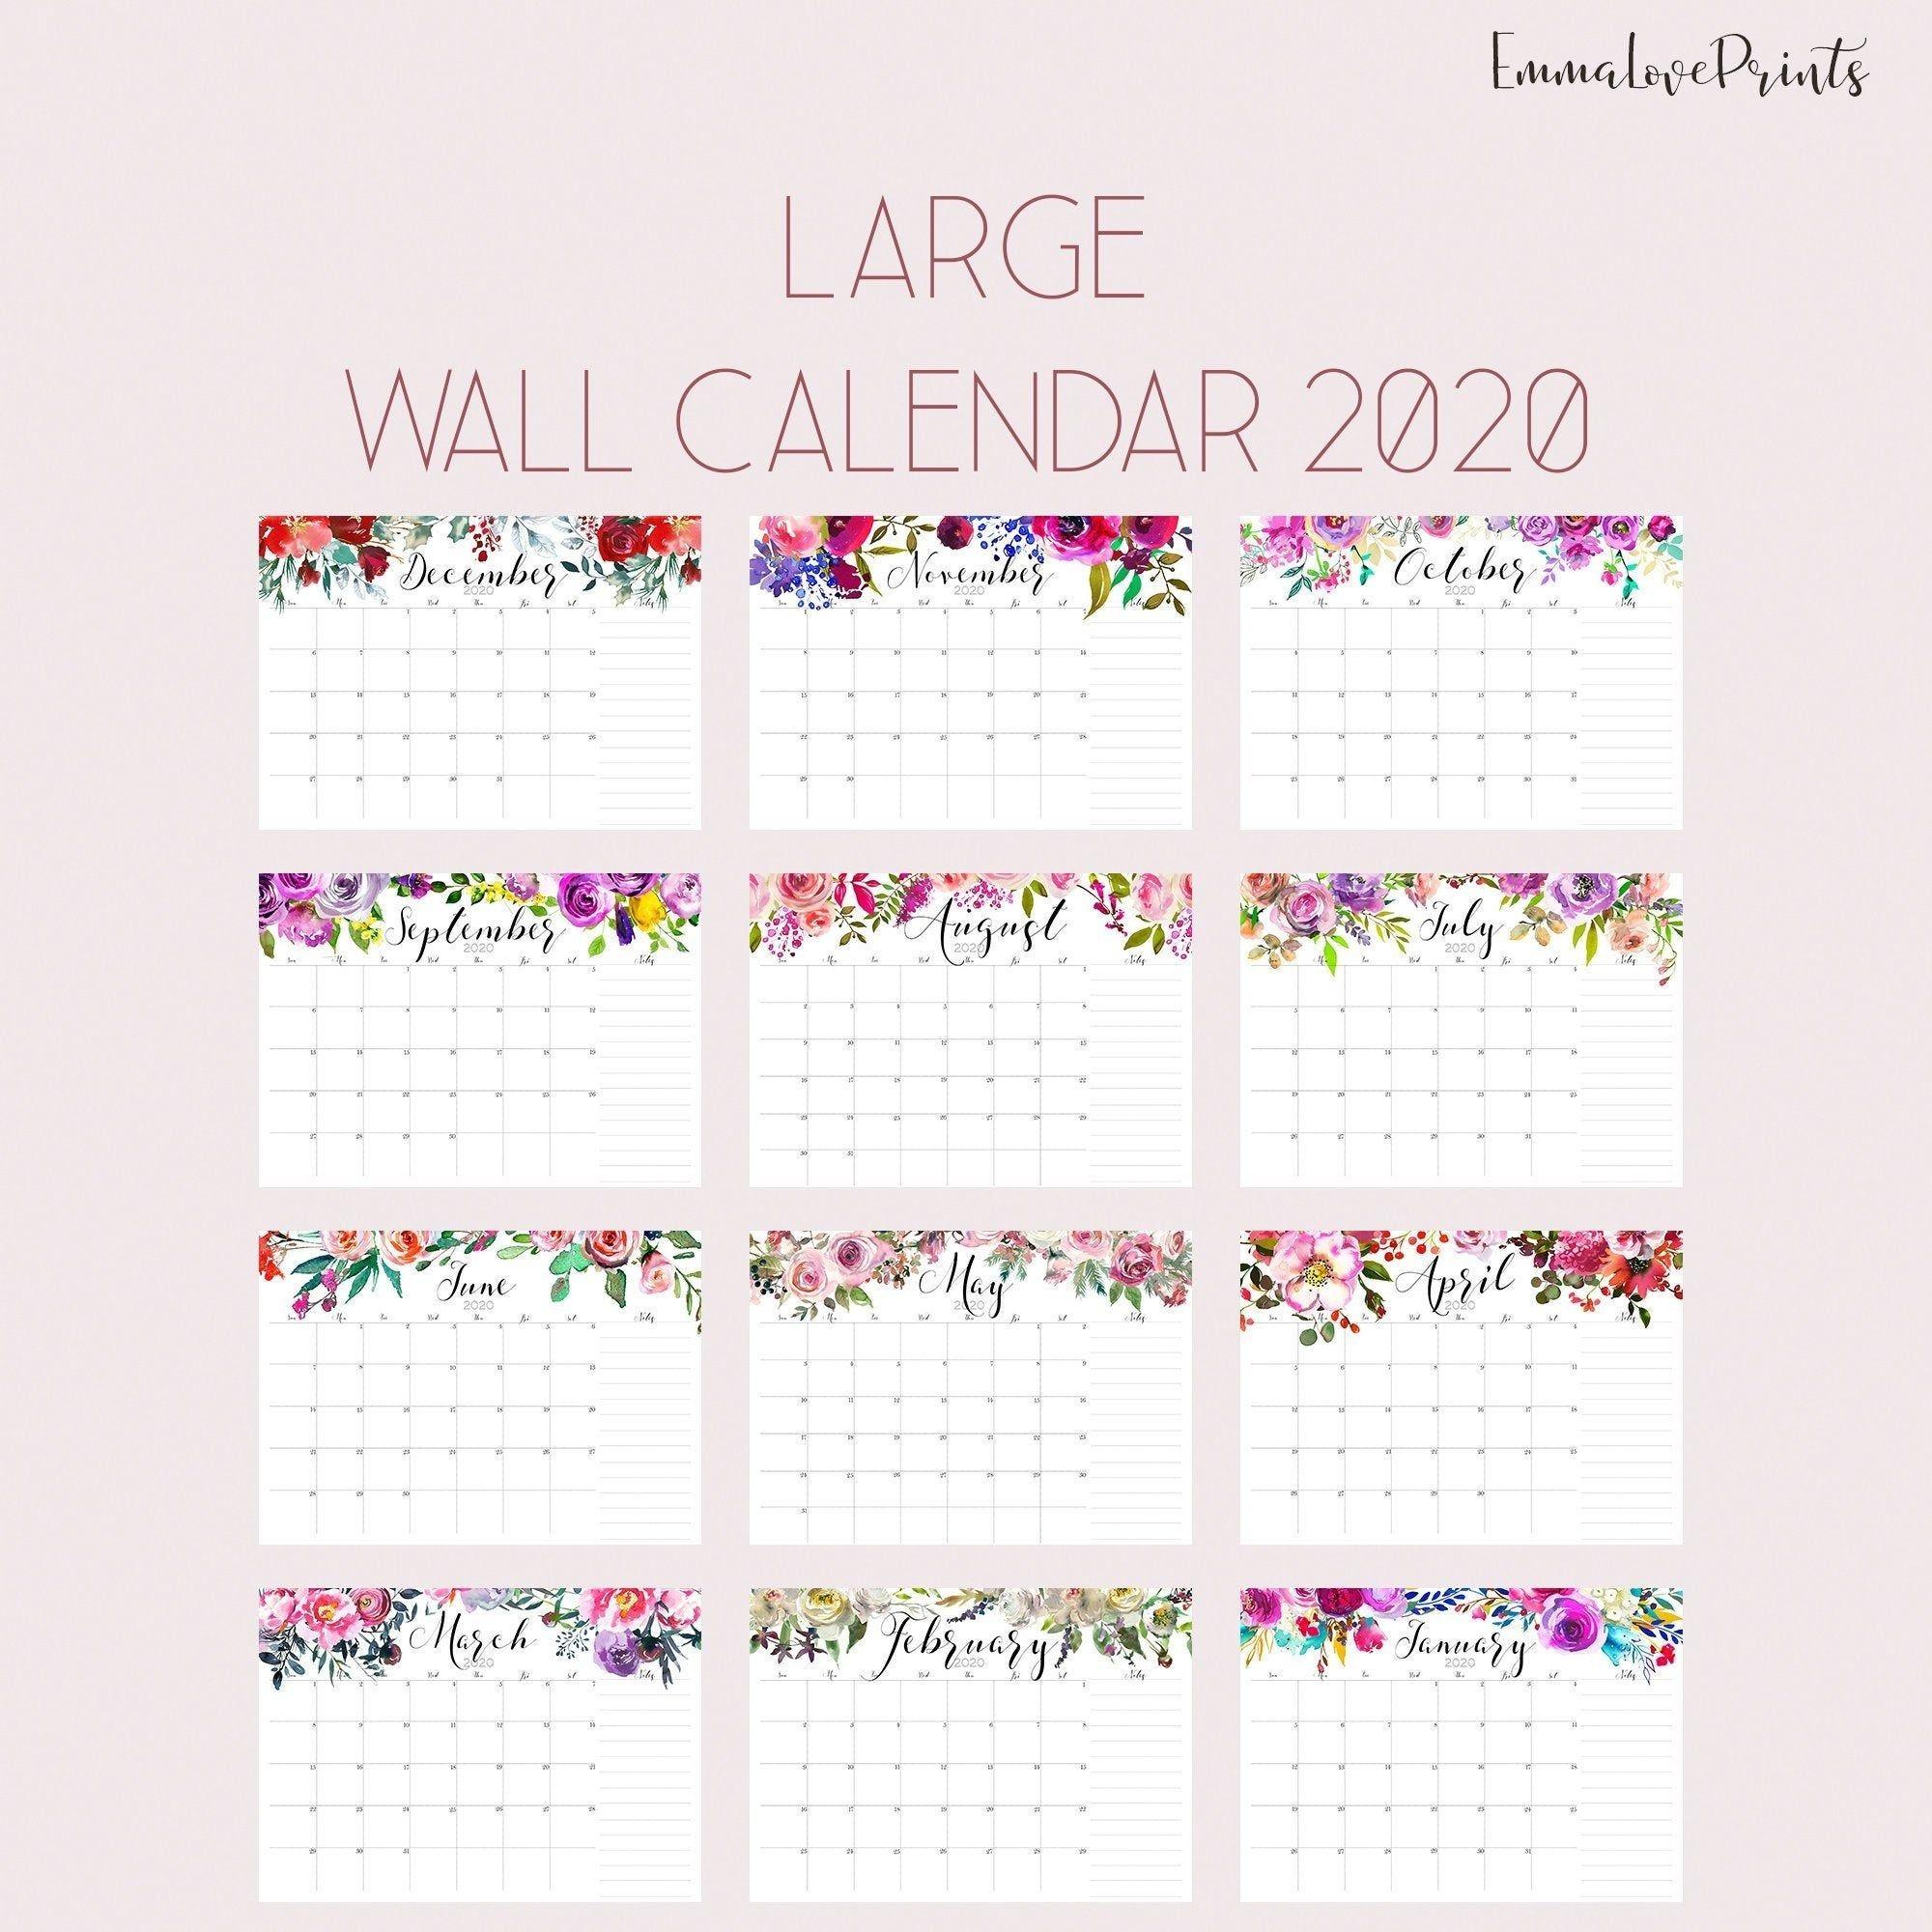 Large Wall Calendar 2020, Watercolor Calendar, A3 Calendar  A3 Calendar 2020